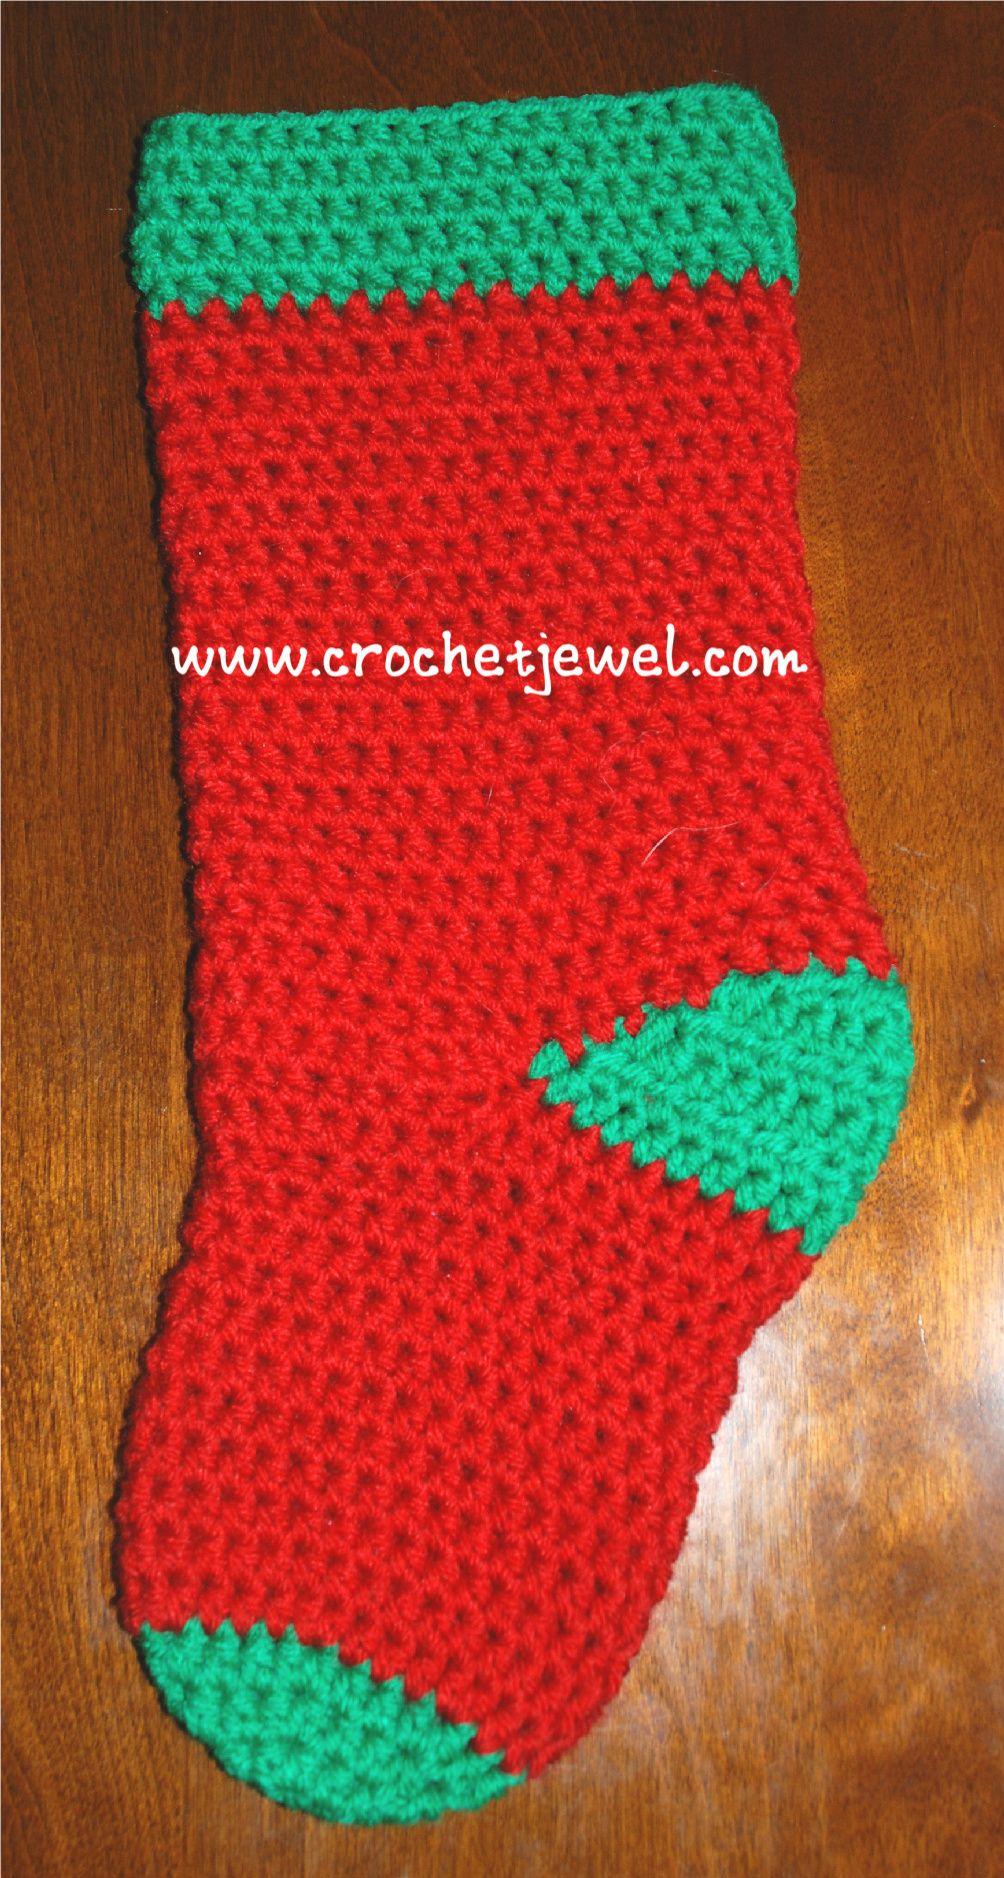 Crochet Christmas Stocking | Zapatillas | Pinterest | Puntadas ...